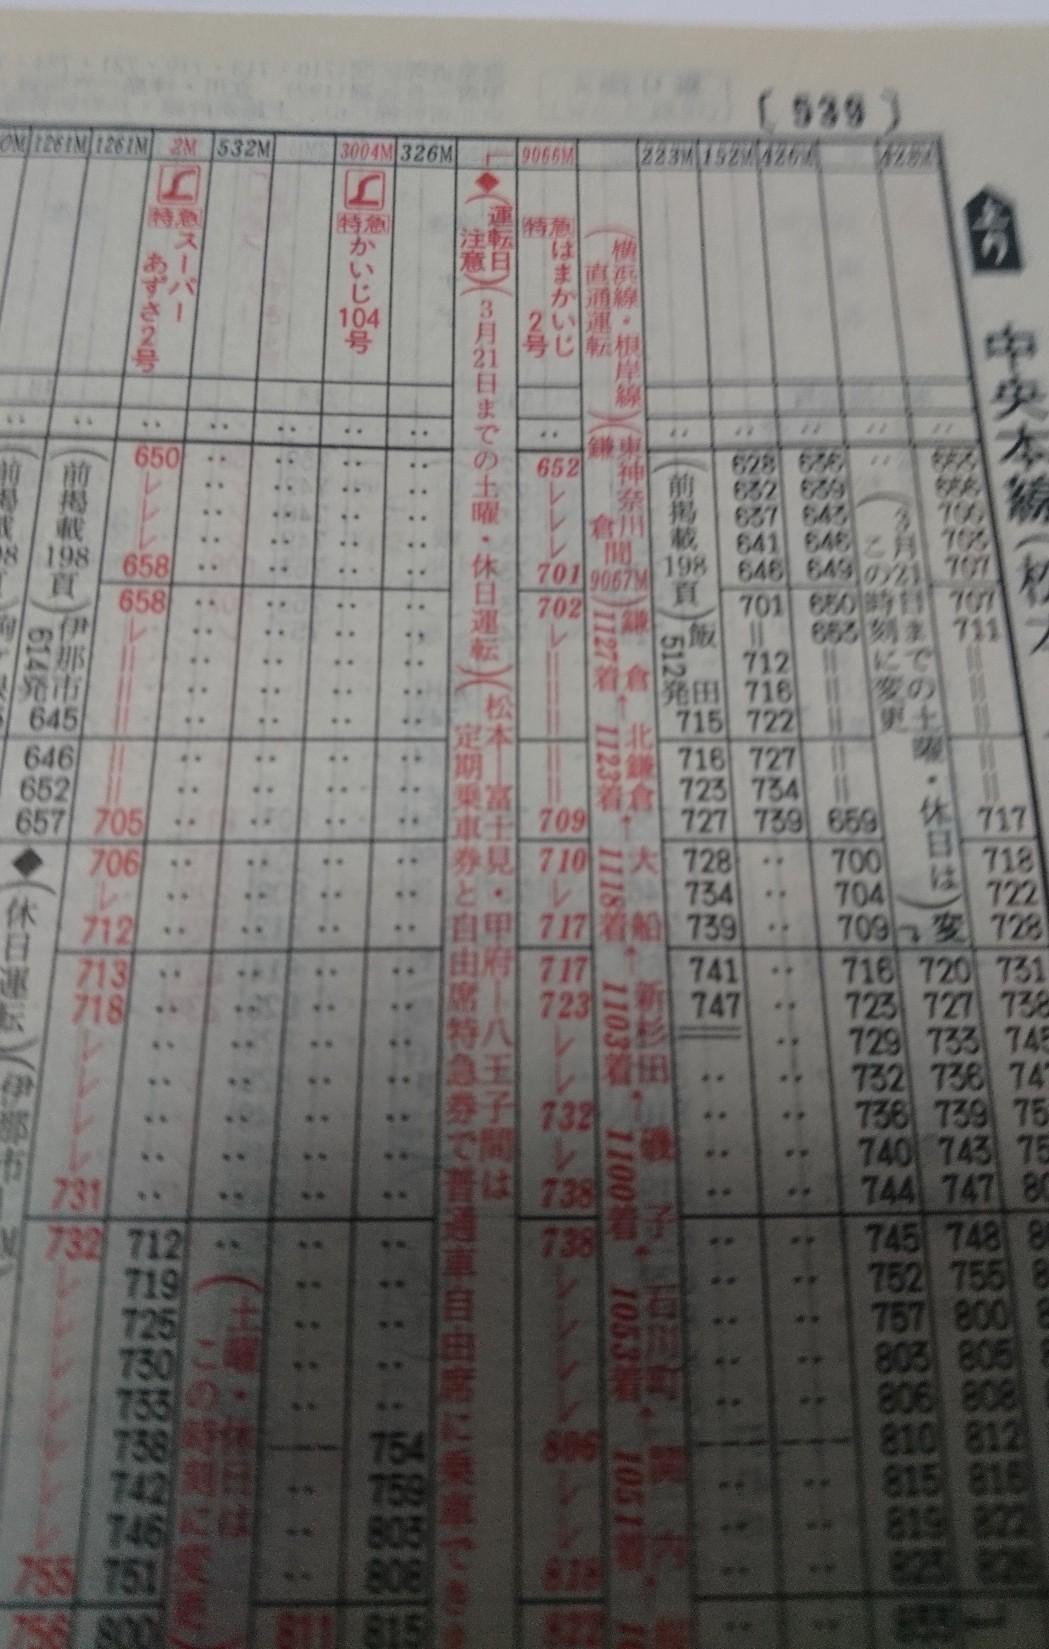 JR時刻表2002年2月号、あずさ2号復活!JR北海道旅客鉄道株式会社、発行所、交通新聞社_b0106766_19392443.jpg